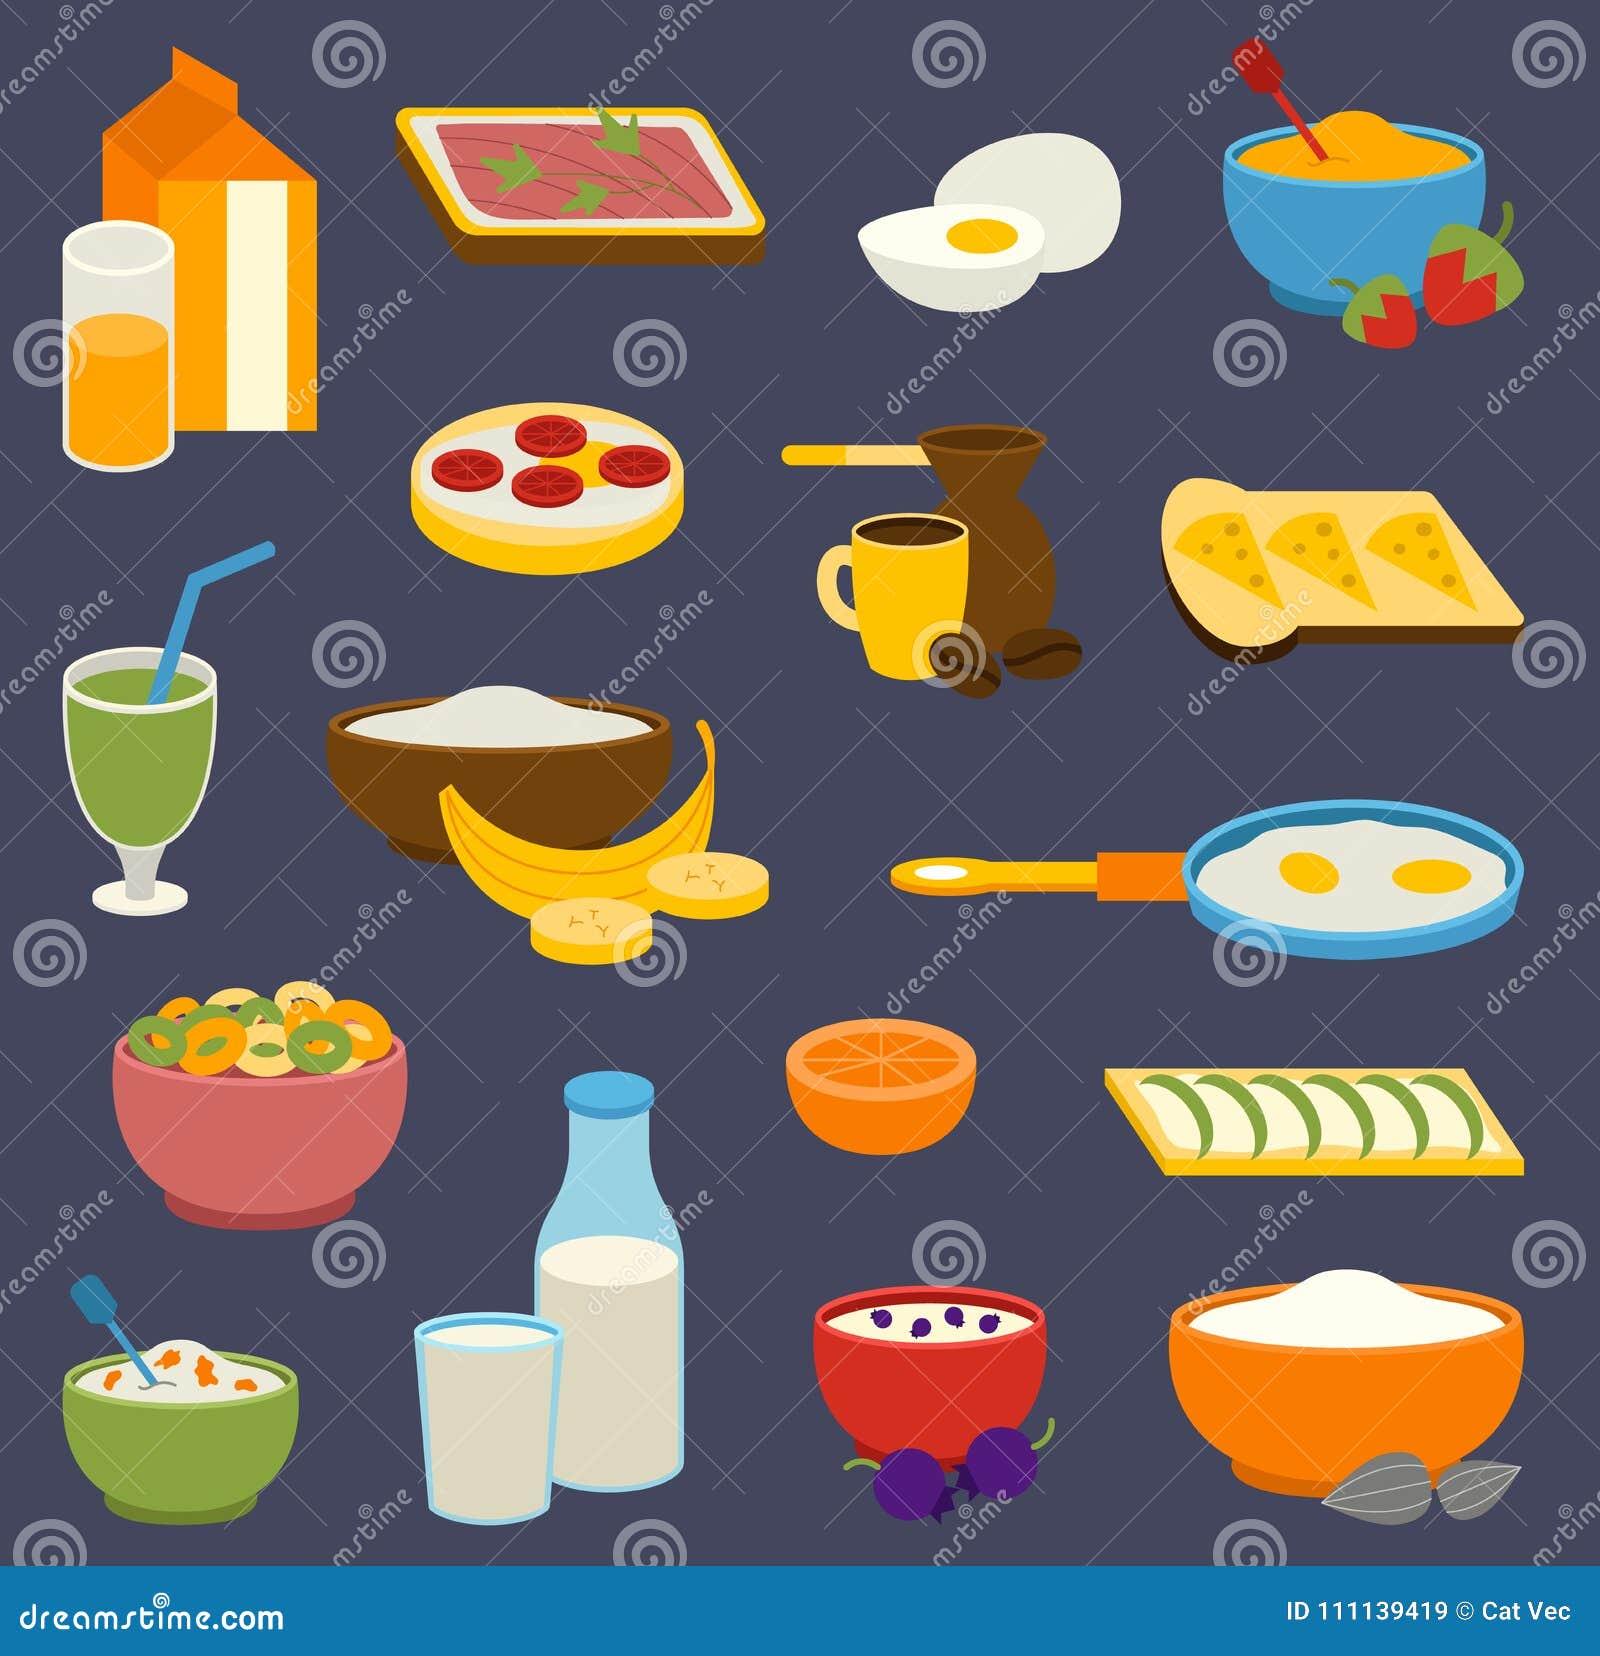 dieta hidratos carbono proteinas